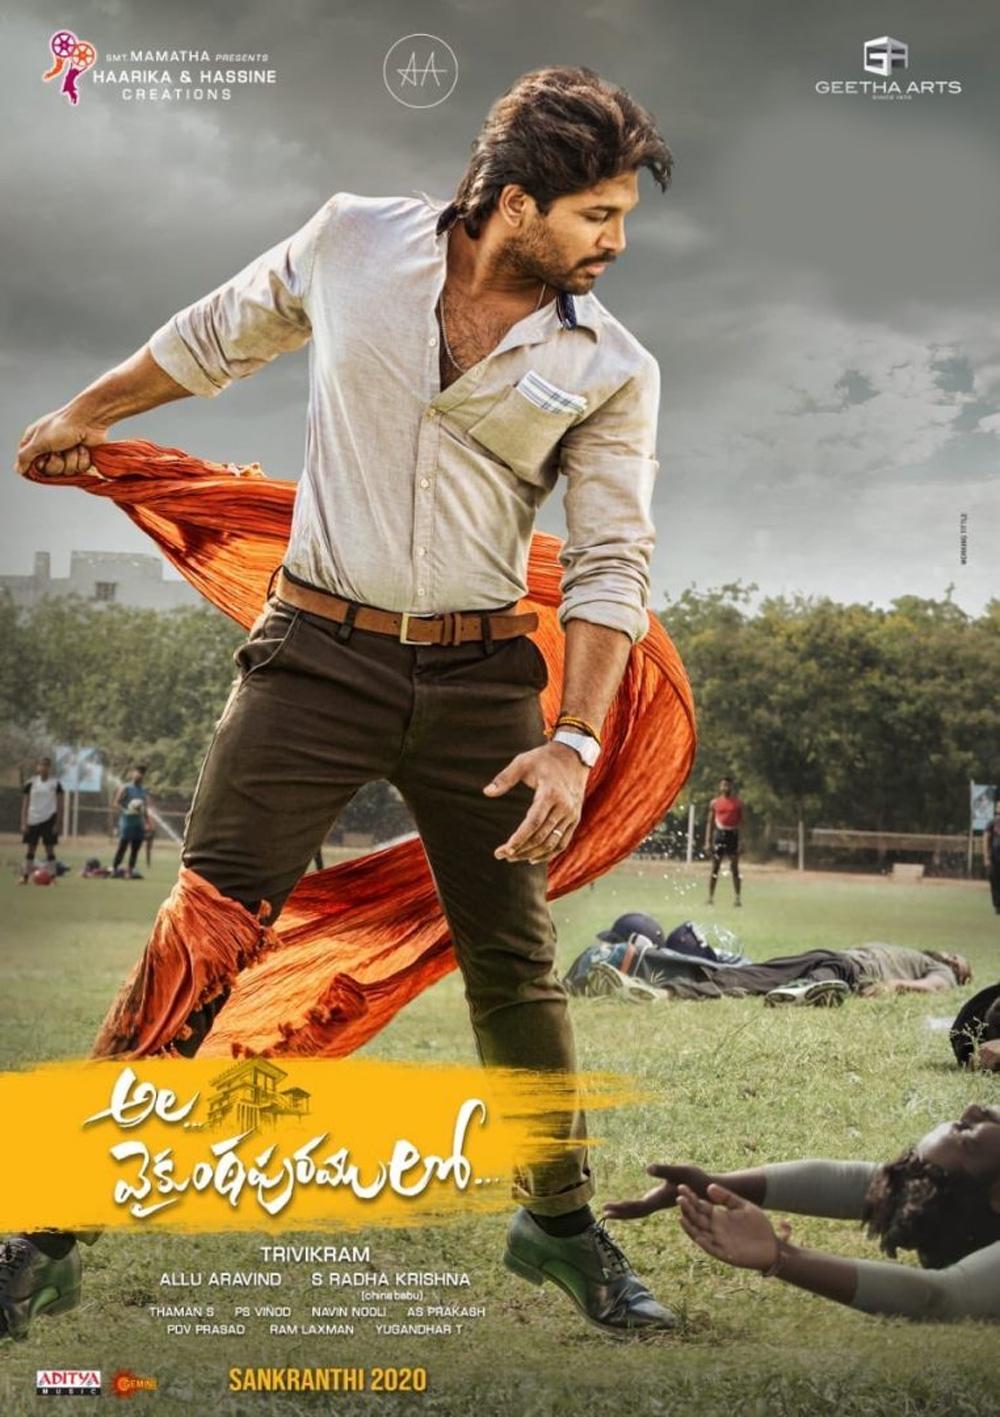 Telugu Ala Vaikunta Puramulo, Allu Arjun, Bunny Record, Tollywood Box Office, Tollywood Gossips, బన్నీ-Latest News